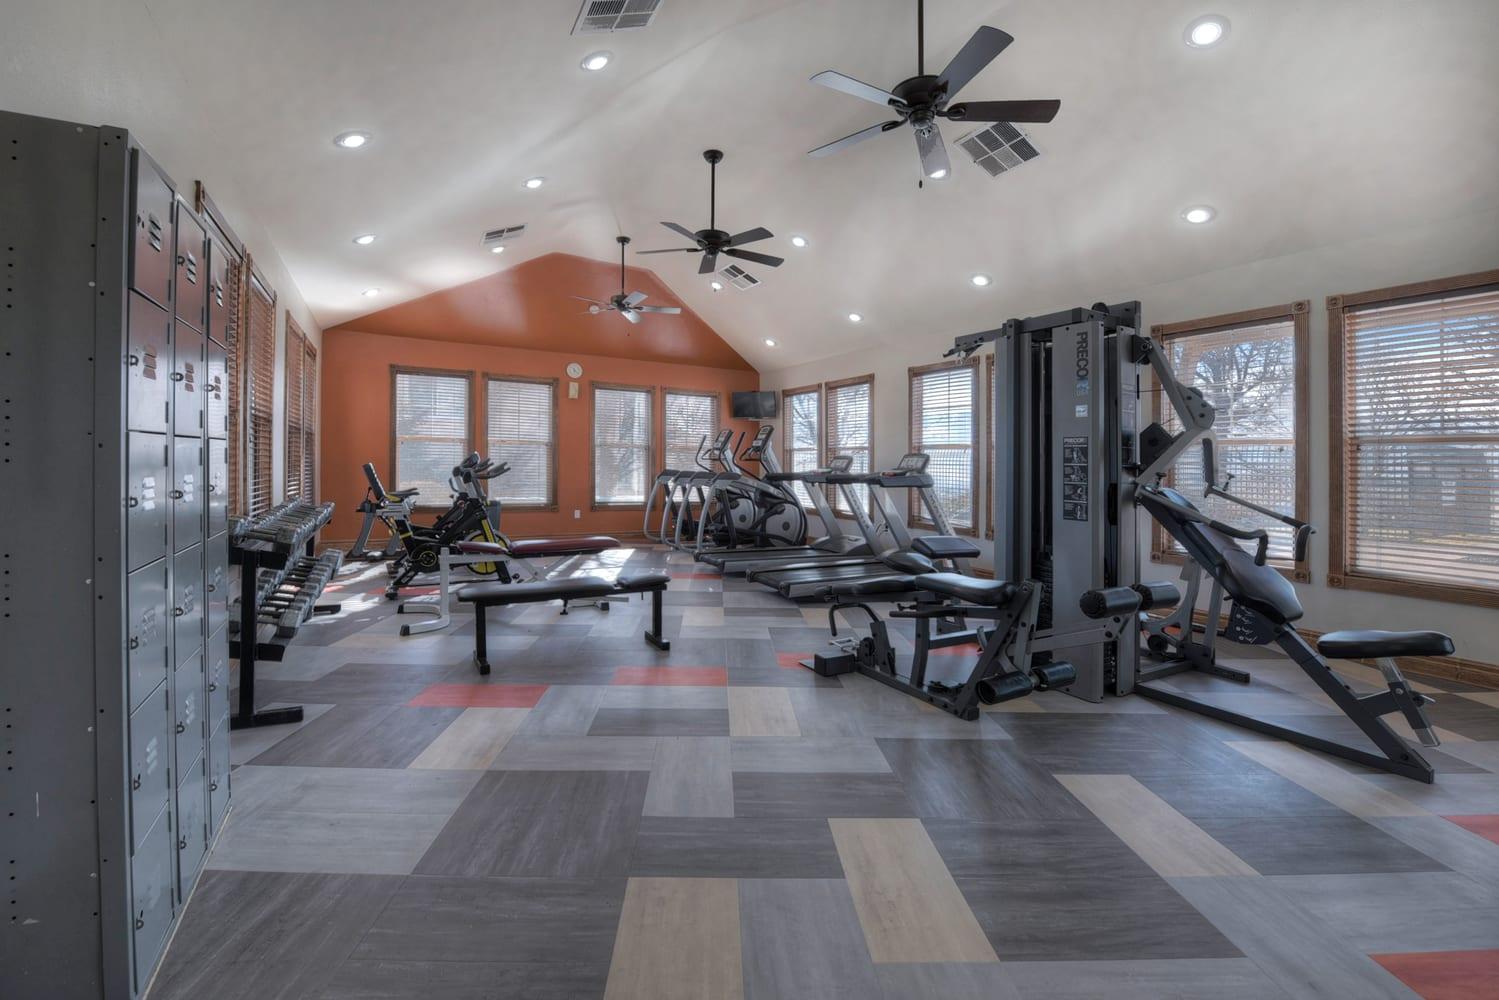 State-of-the-Art Fitness Centerat Manzanita Gate Apartment Homes, Reno, 89523